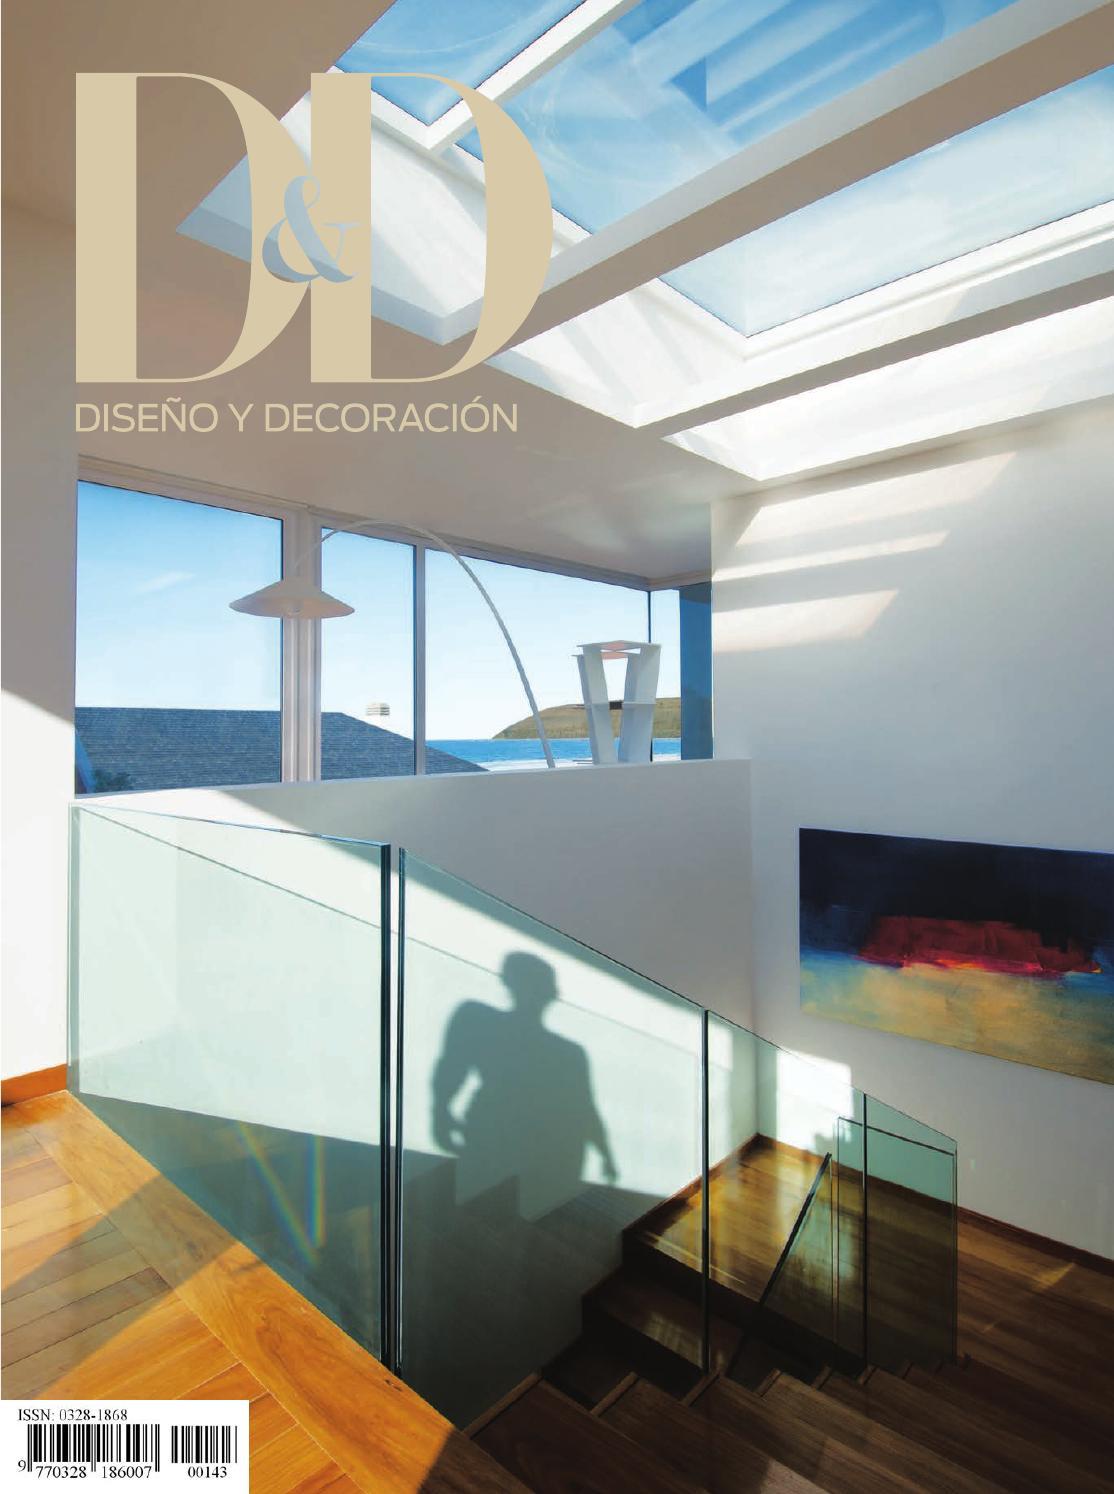 D d edicion aniversario 143 dise o decoraci n arte - Pagina de decoracion de interiores ...